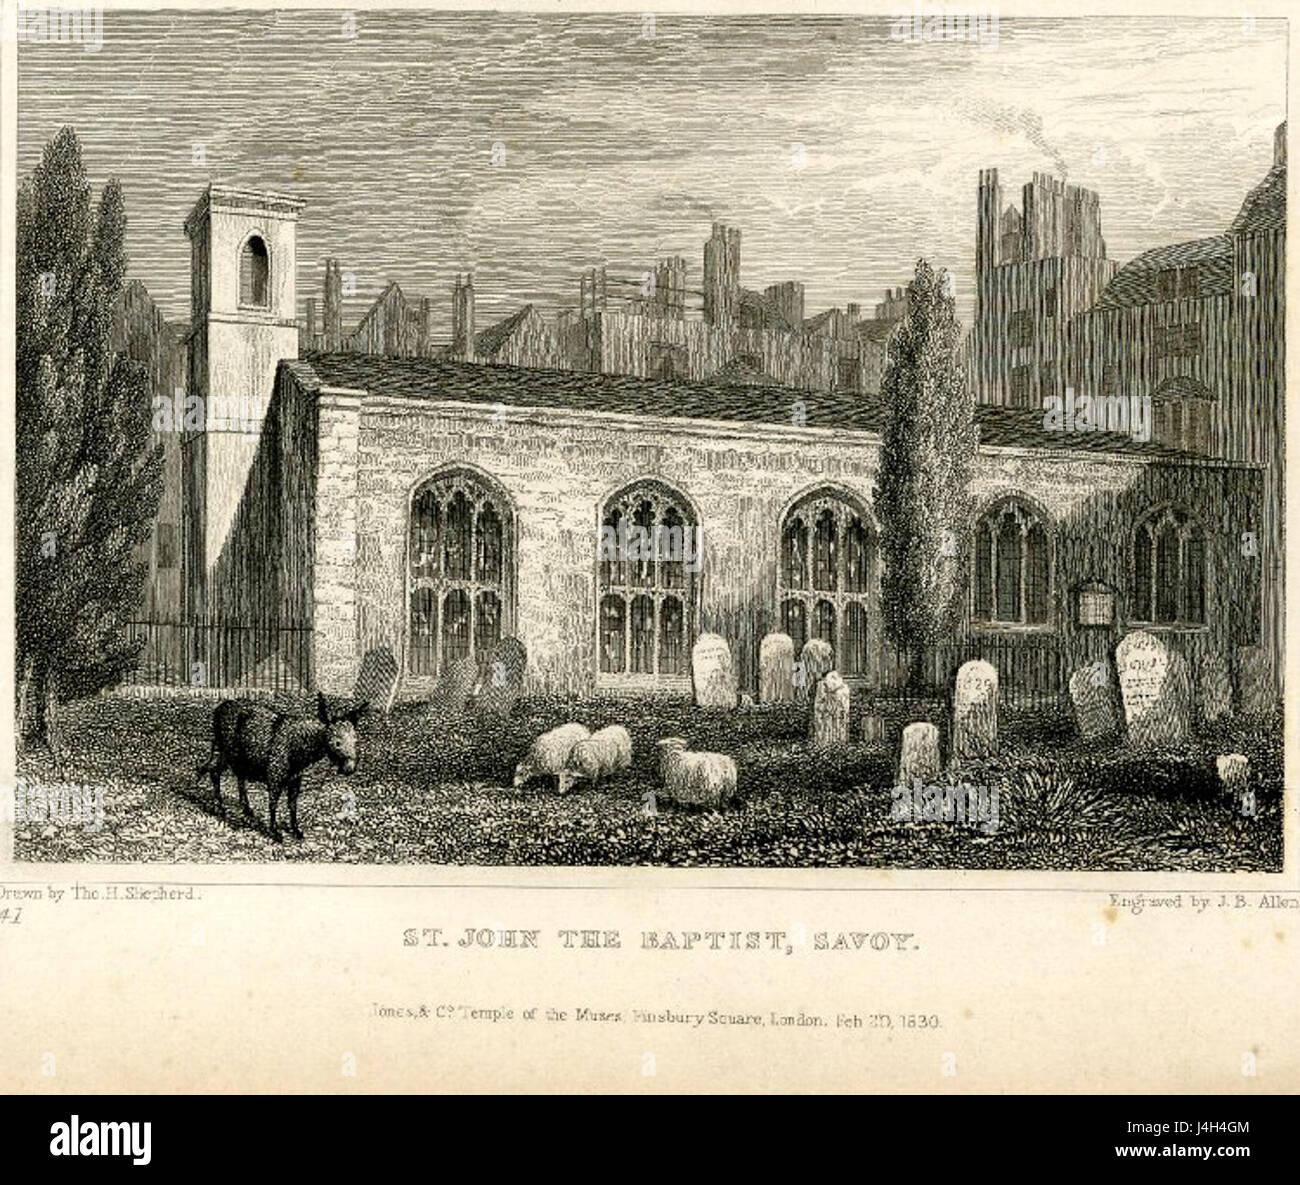 Savoy Chapel Thomas Hosmer Shepherd 1830 Stock Photo